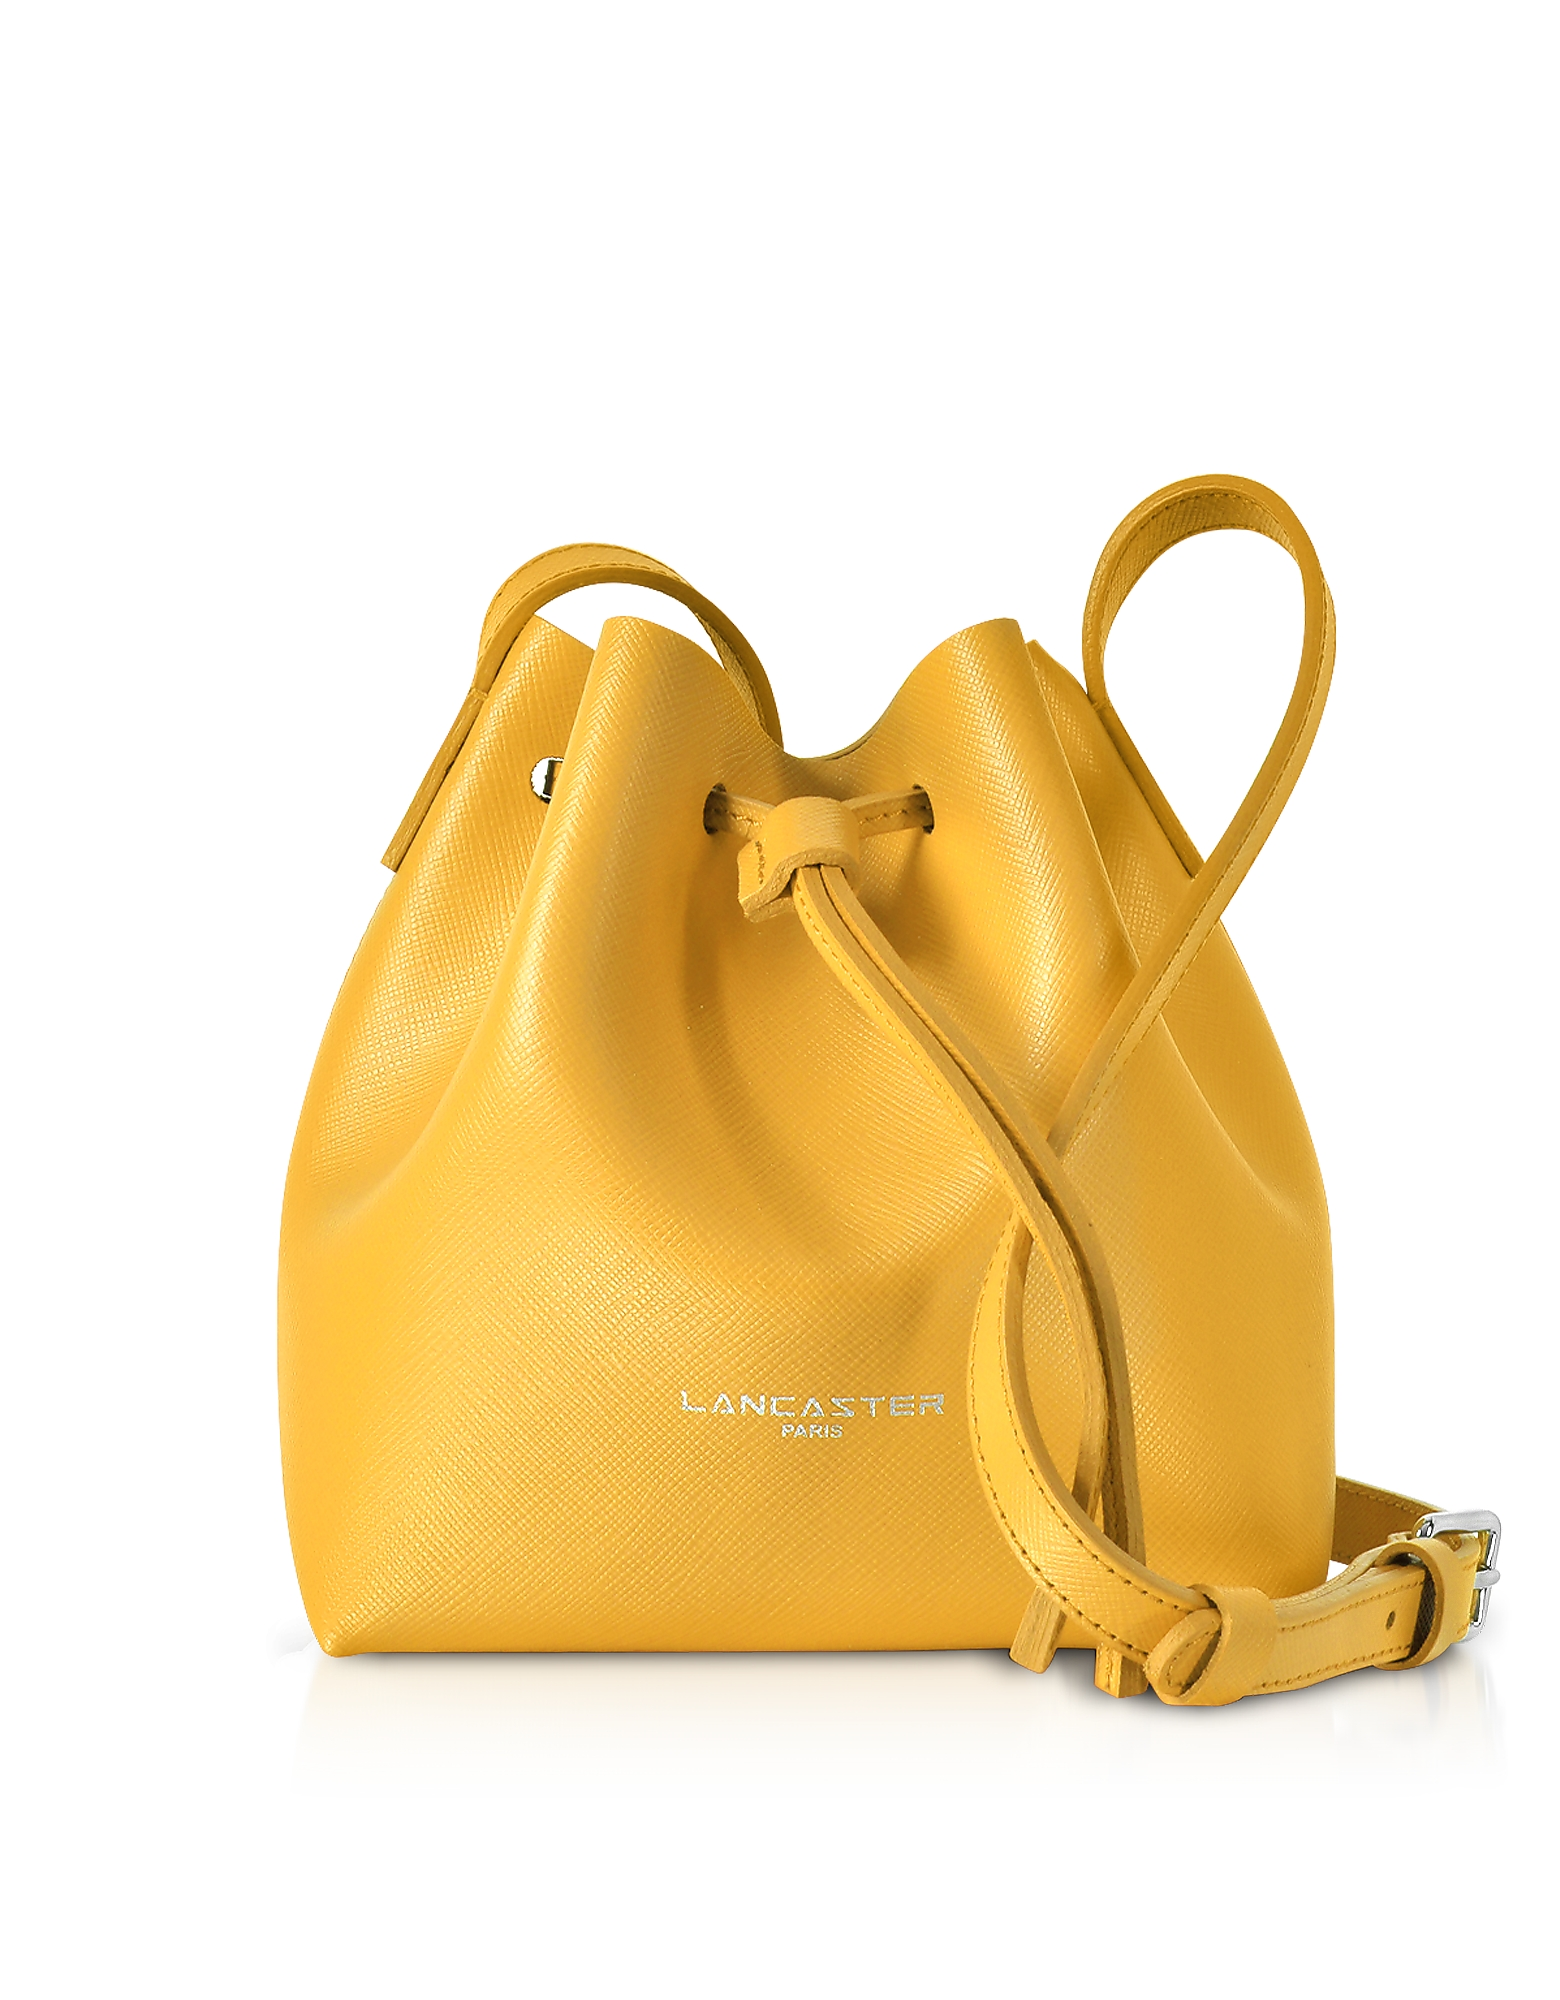 Lancaster Paris Handbags, Pur & Element Saffiano Mini Bucket Bag